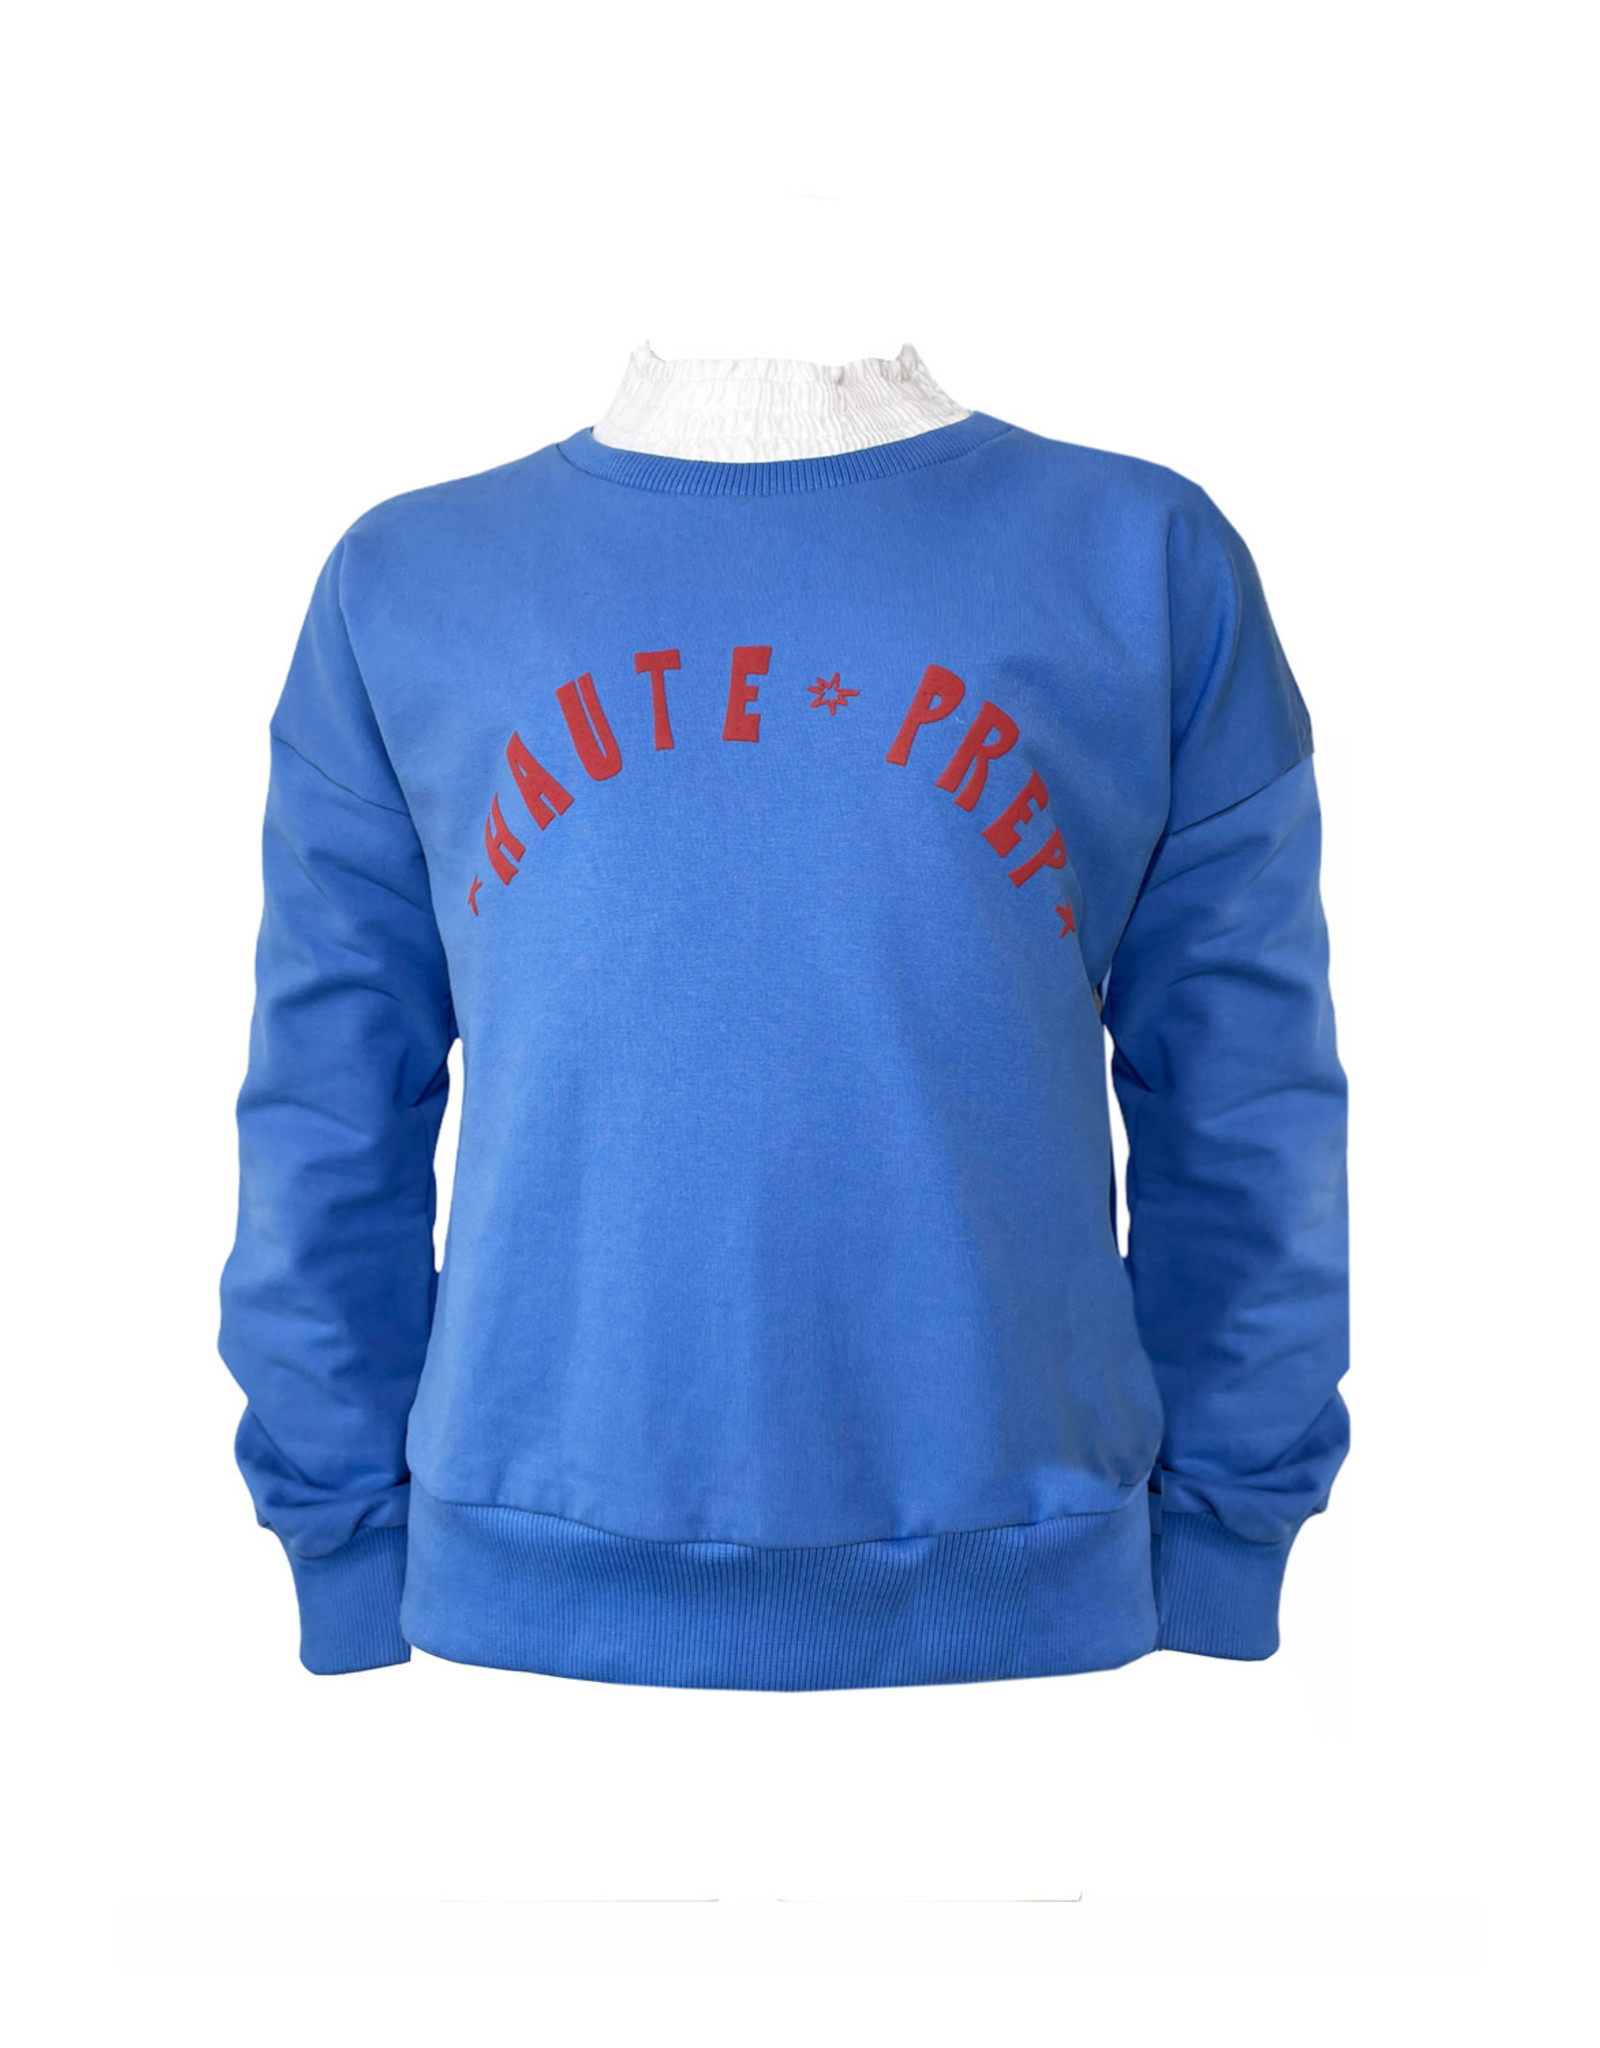 Topitm Ariana sweater light blue